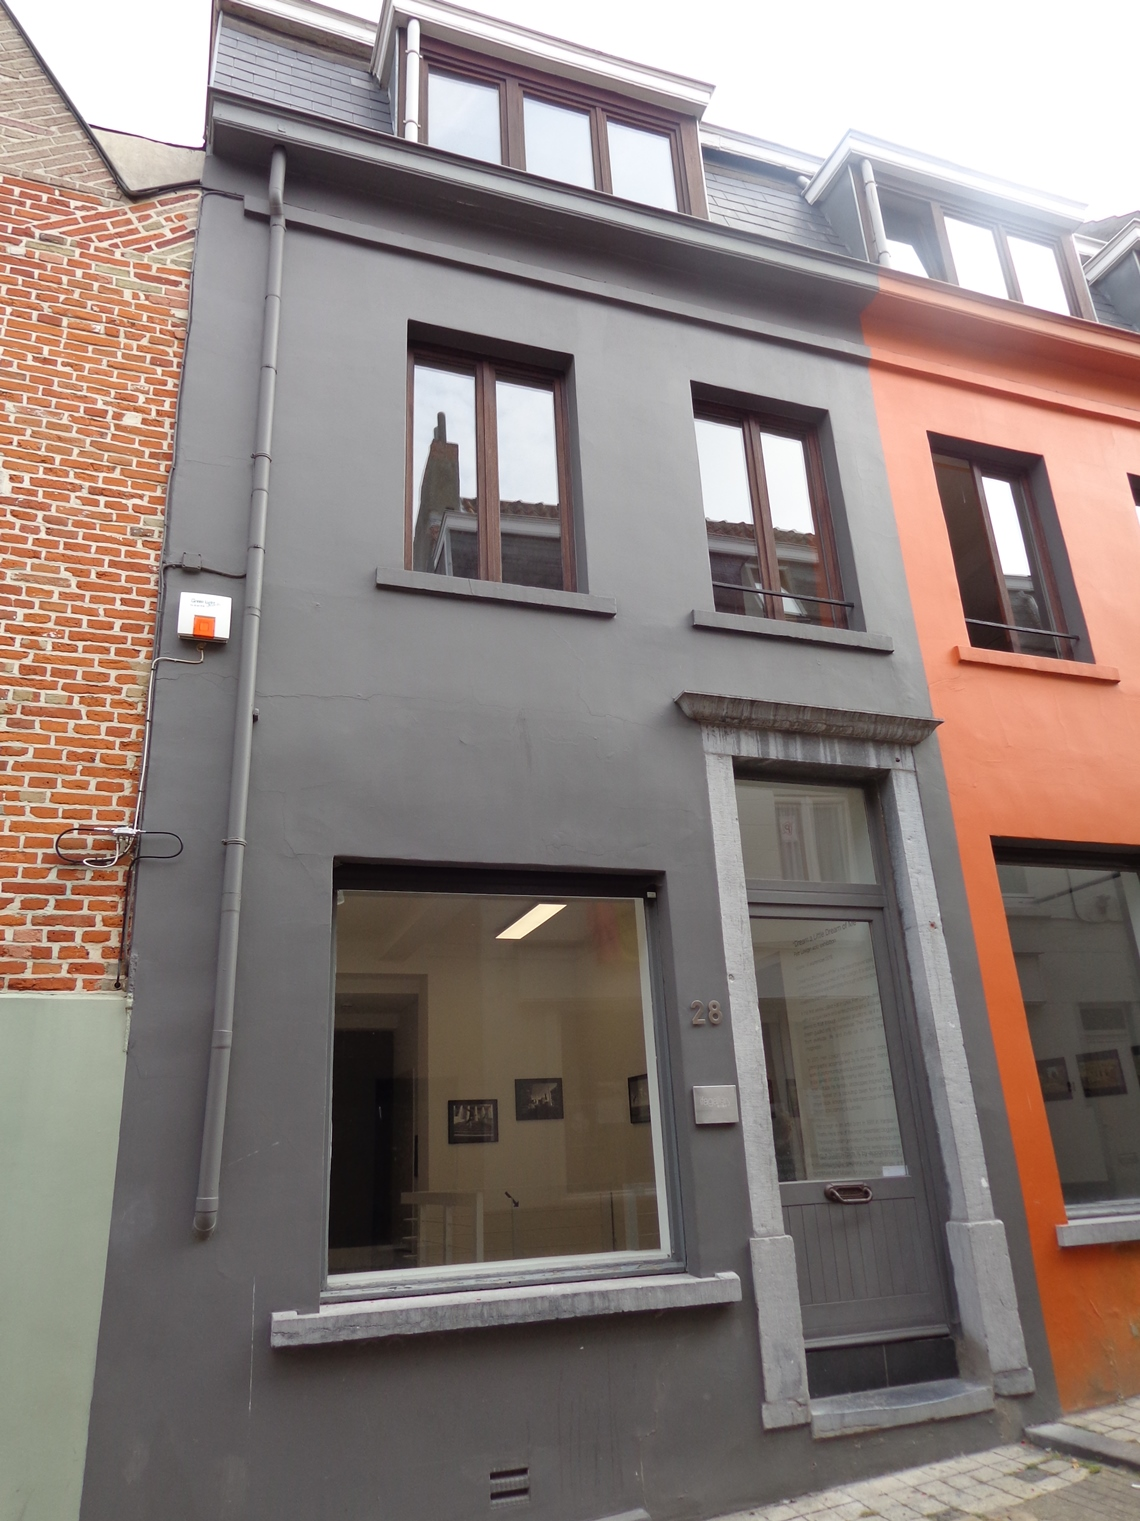 Rue des Renards 28, 2015